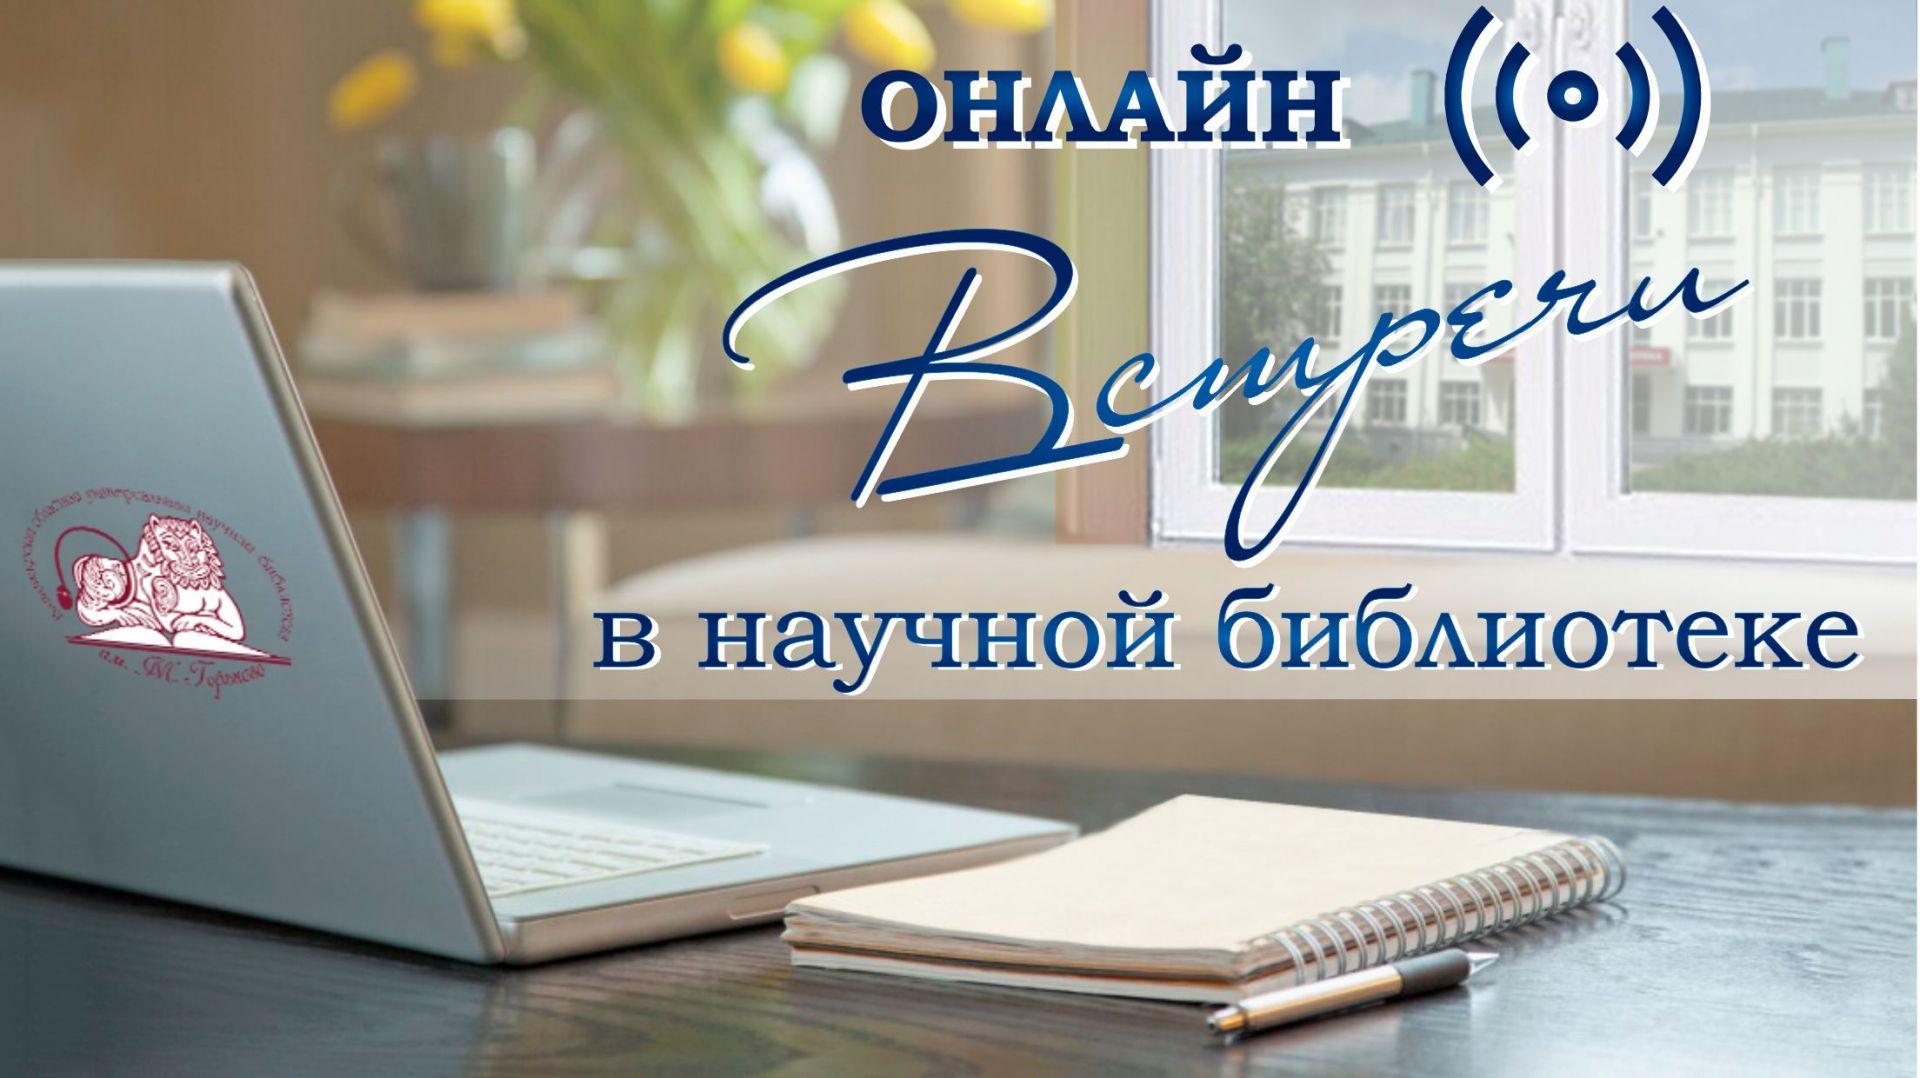 Афиша встречи онлайн в научке